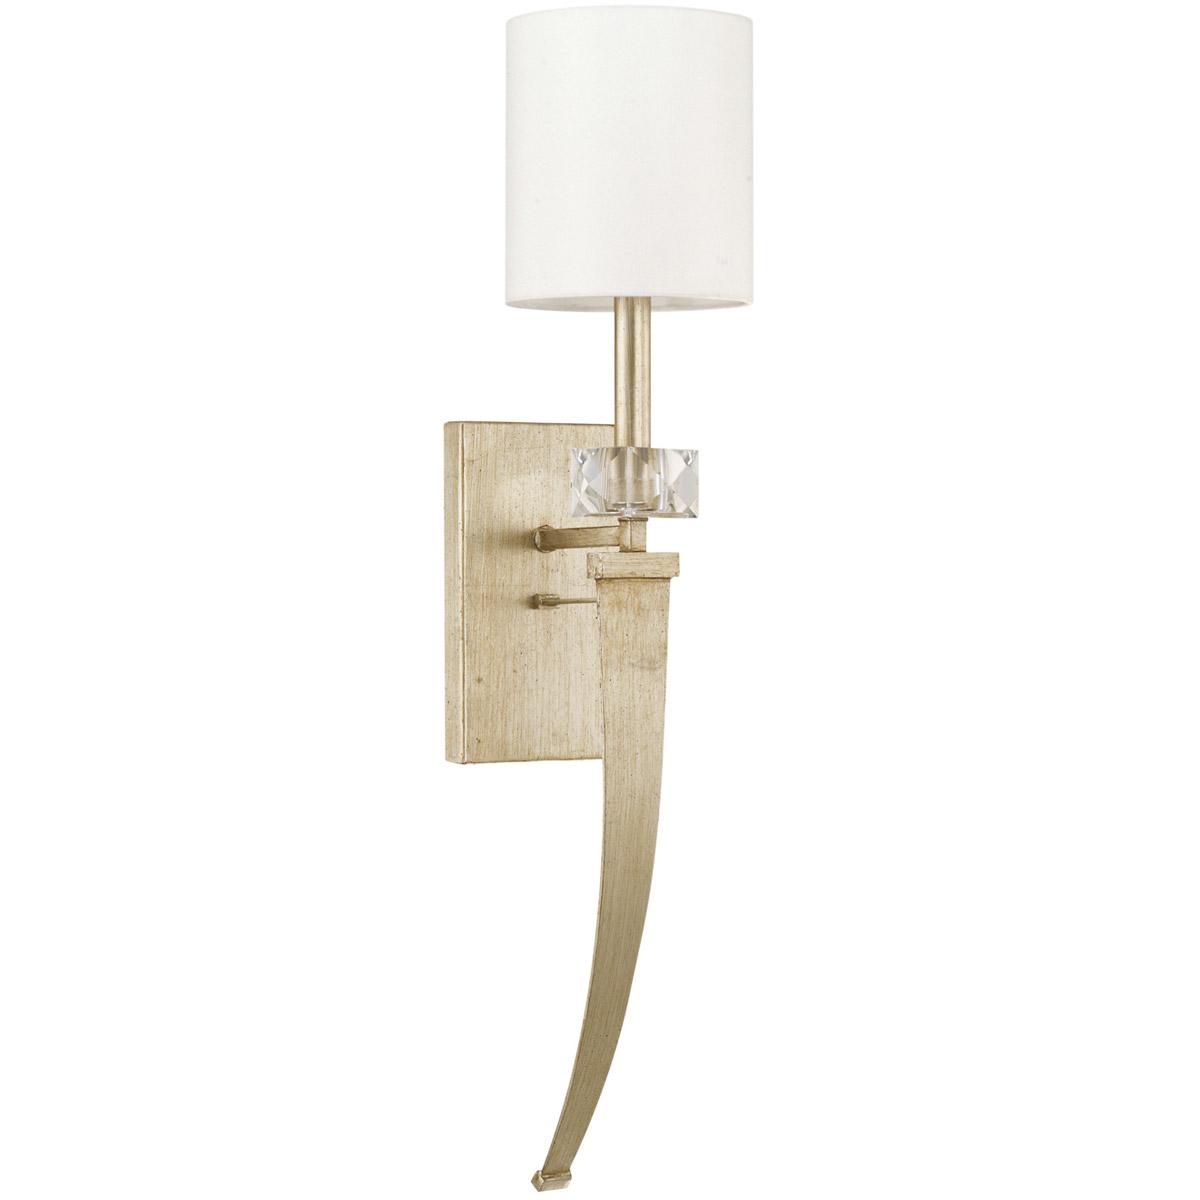 Capital lighting fixtures 628111wg 565 karina wall sconce winter gold